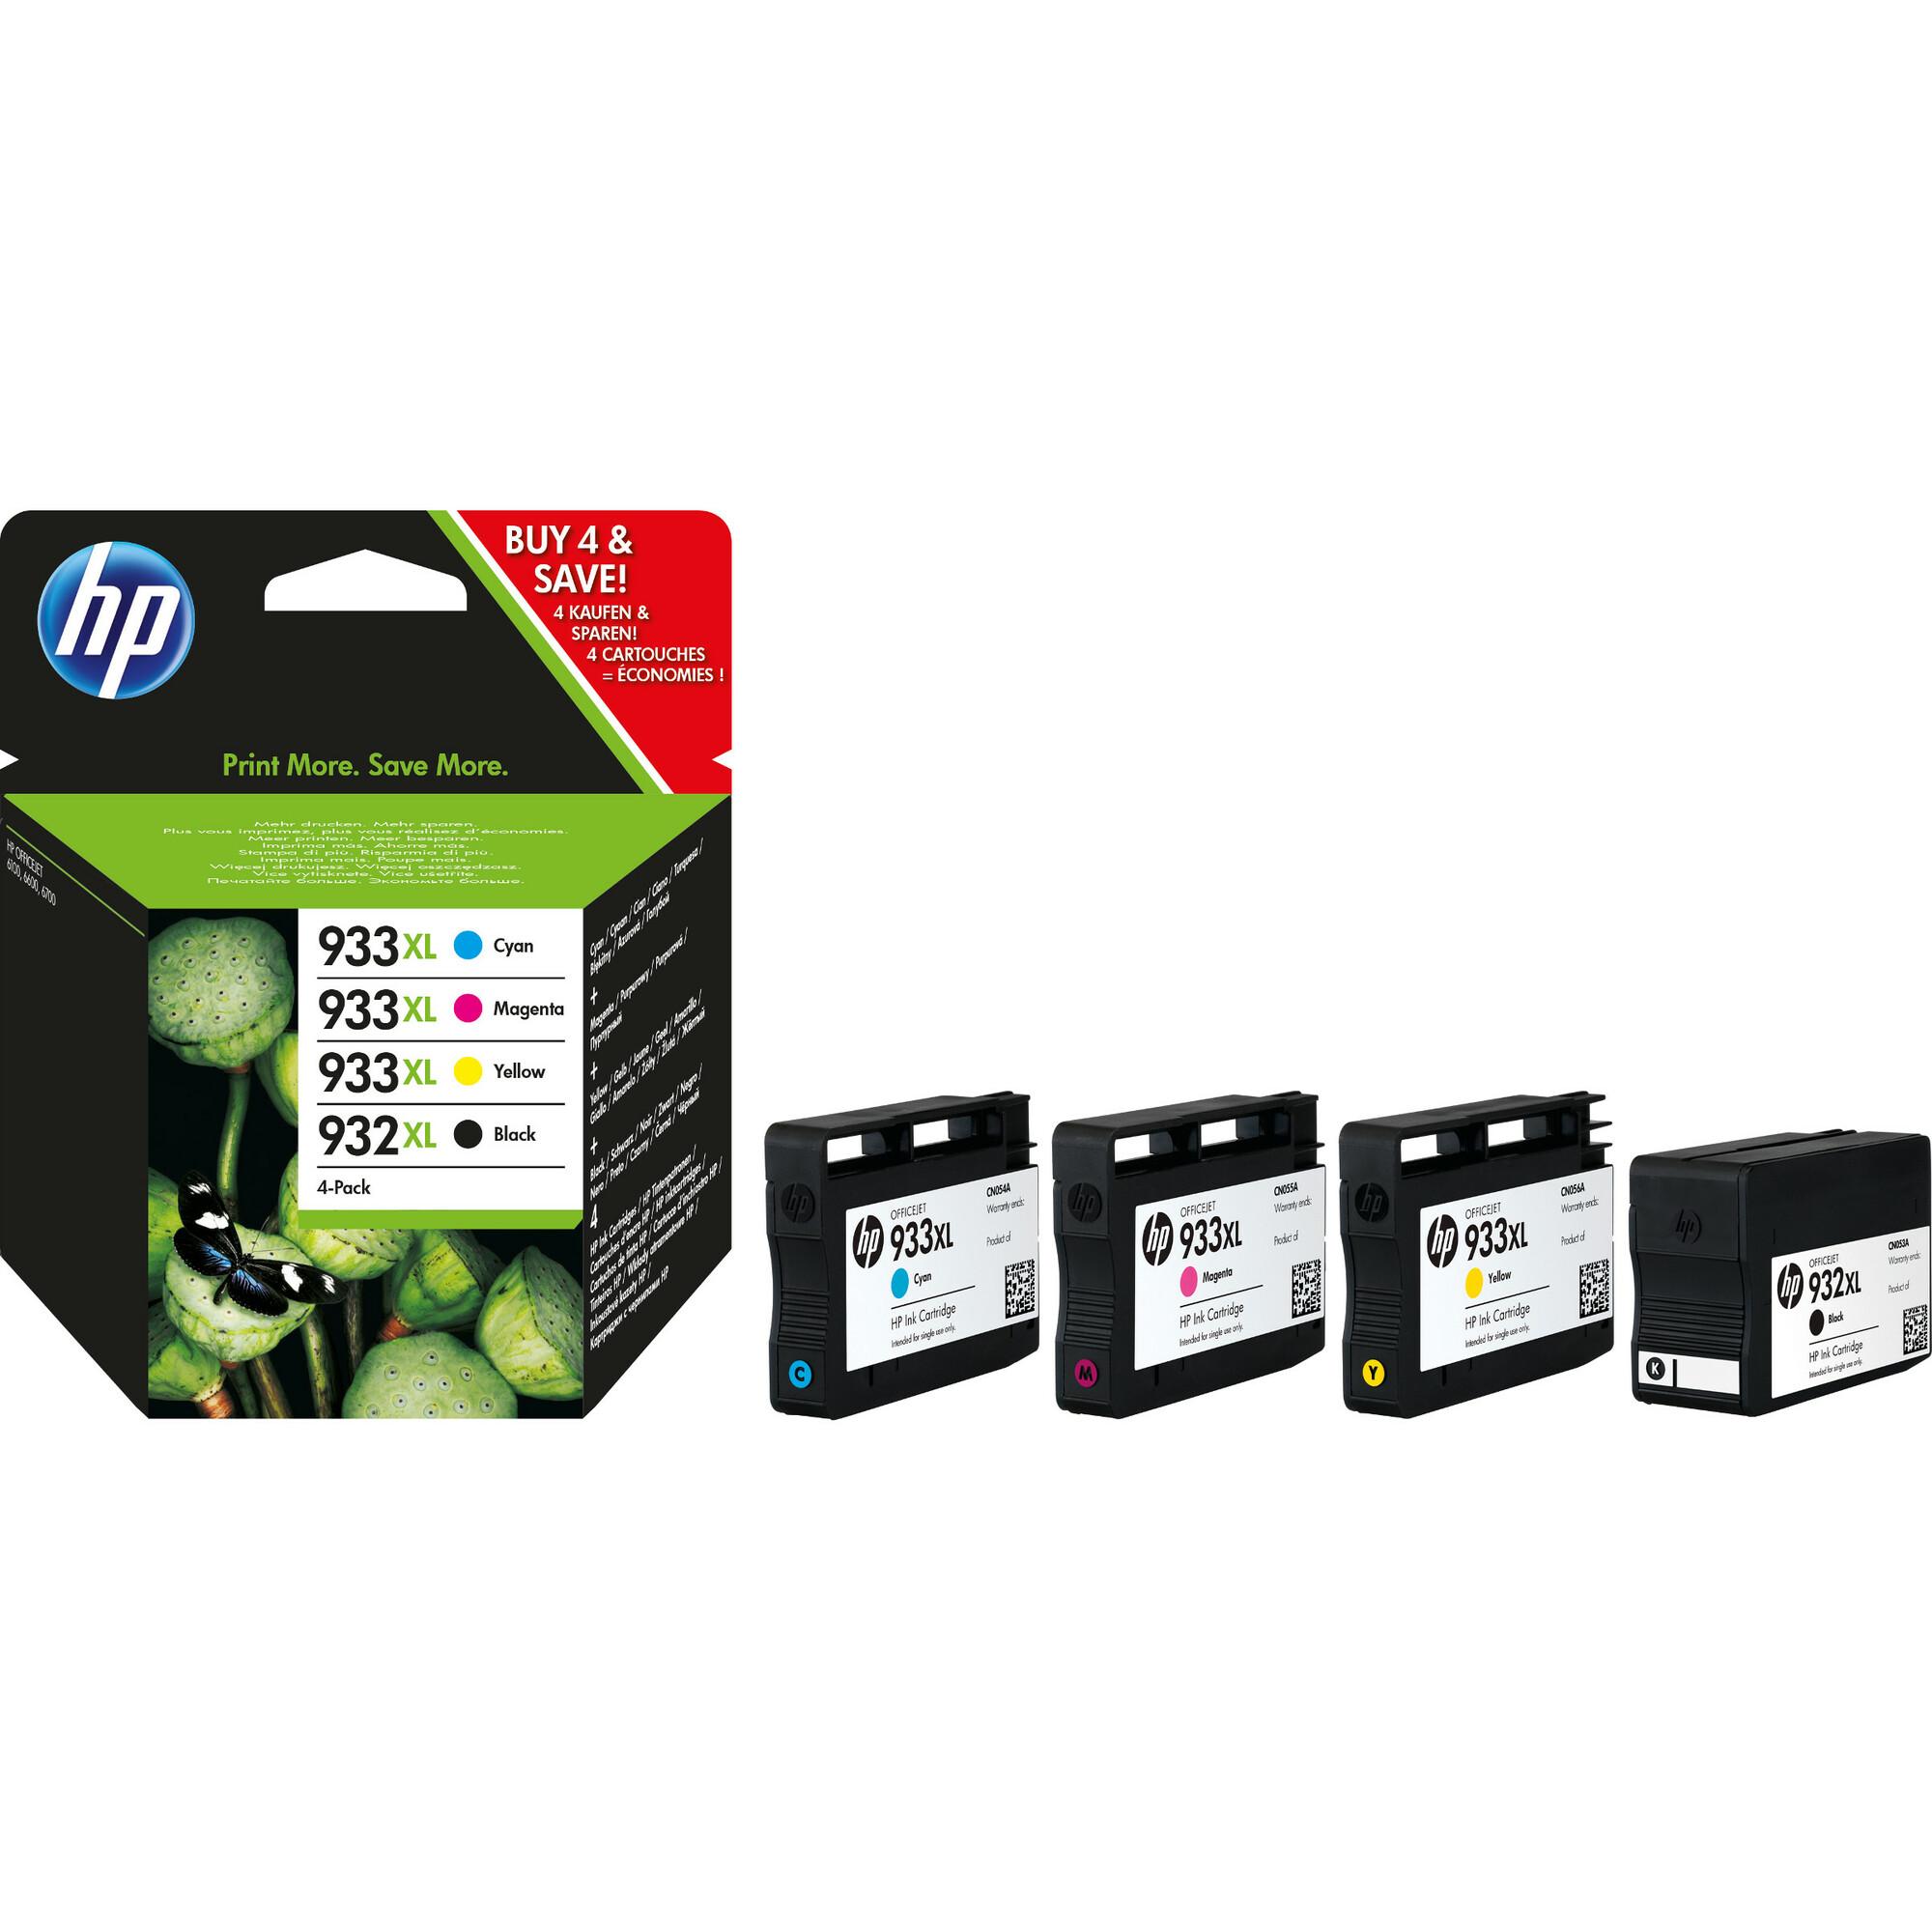 HP 932XL/933XL Ink Cartridge - Yellow, Magenta, Black, Cyan